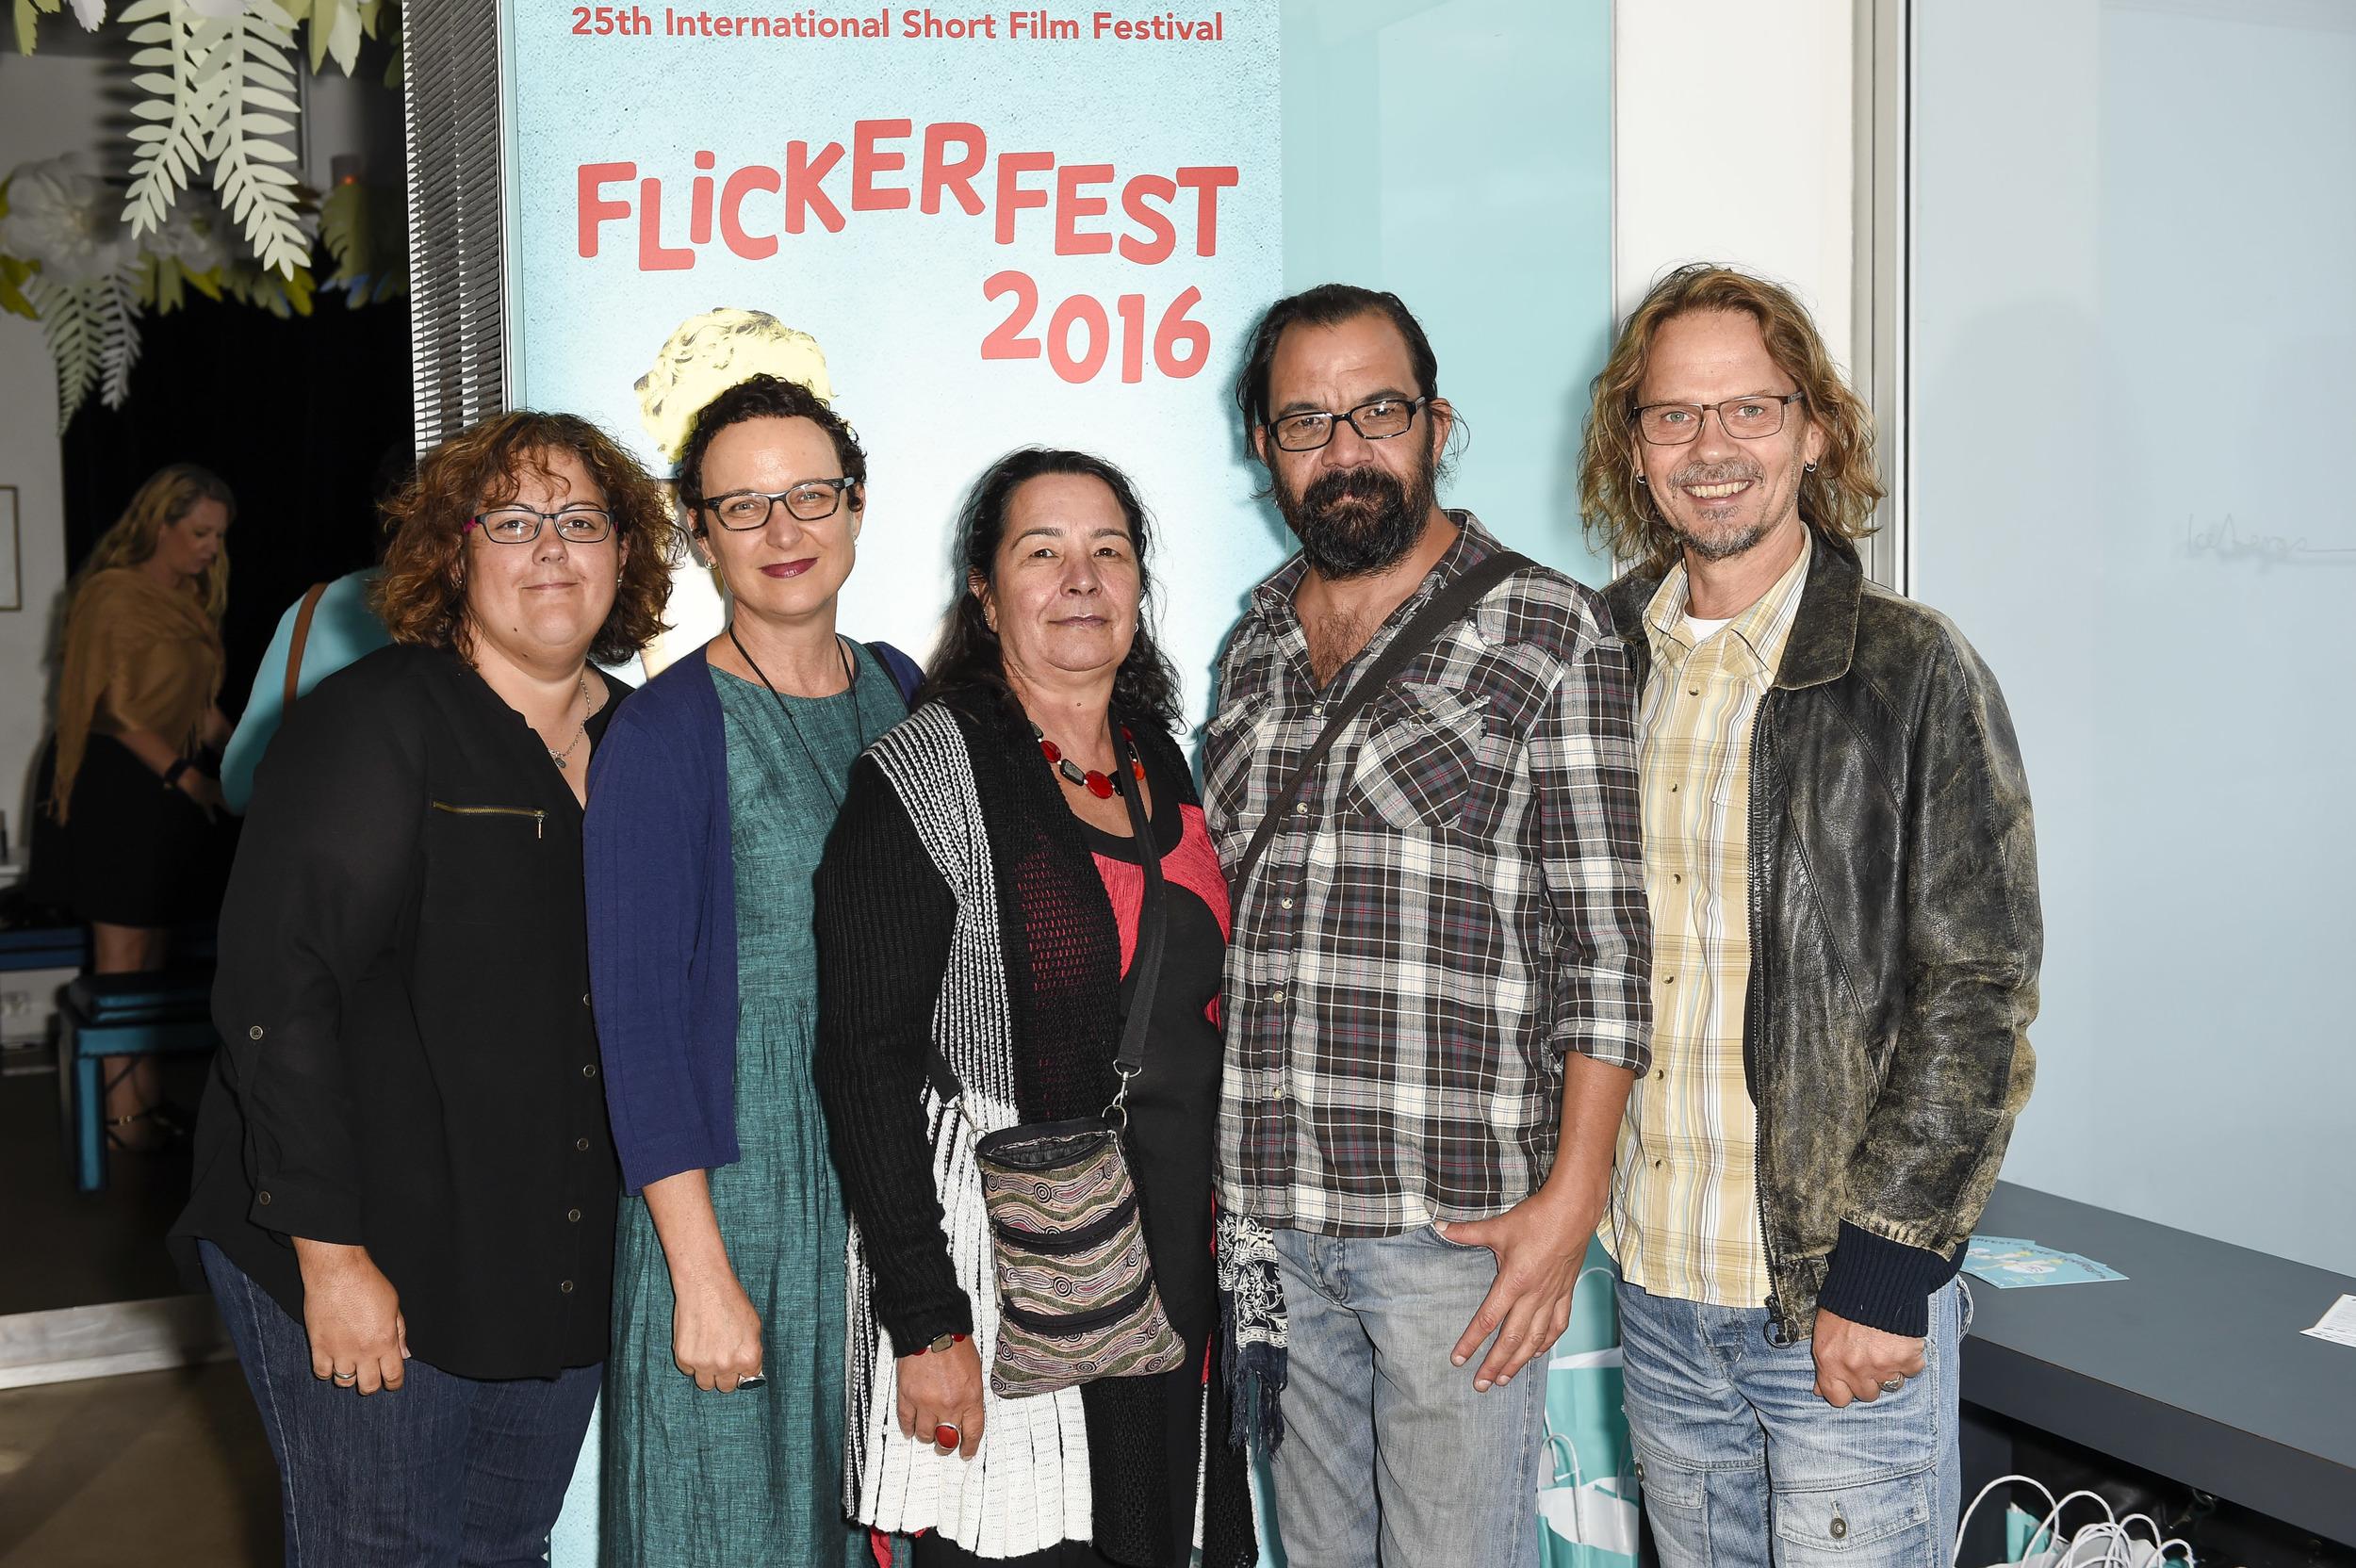 Flickerfest 2016 Launch |_A000112.jpg